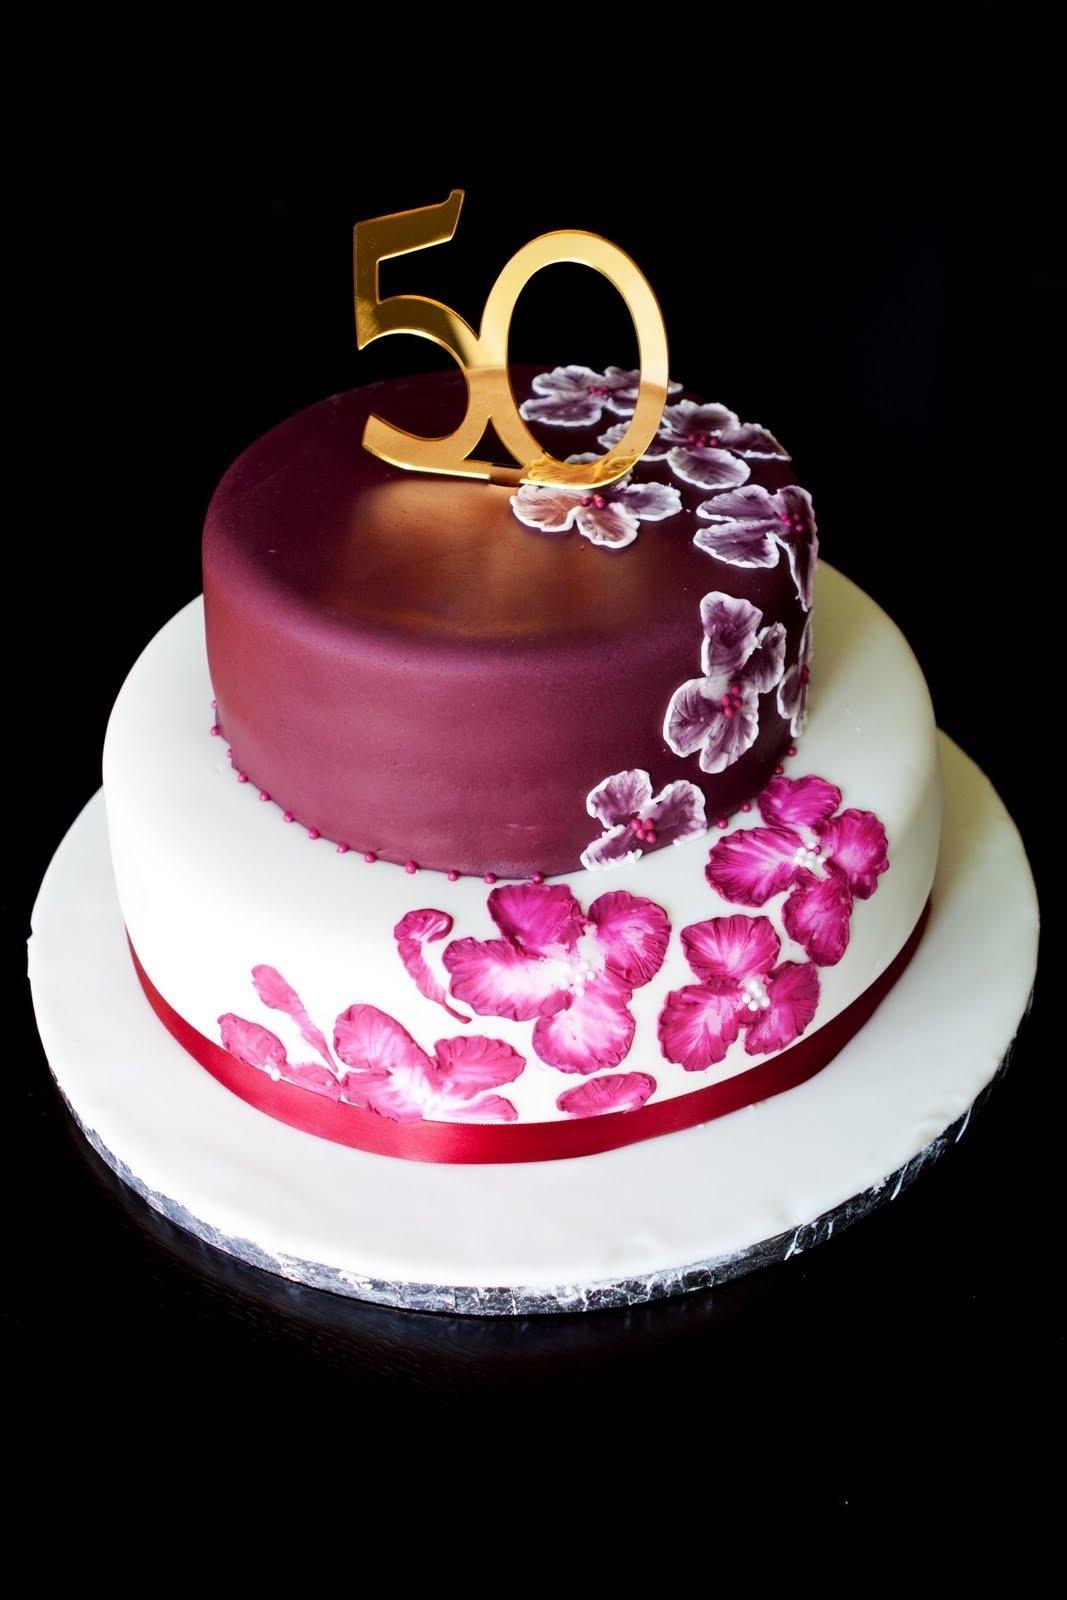 10 Wonderful Ideas For 50Th Birthday Cake unique elegant birthday cakes 50th birthday cake ideas birthday 2 2020